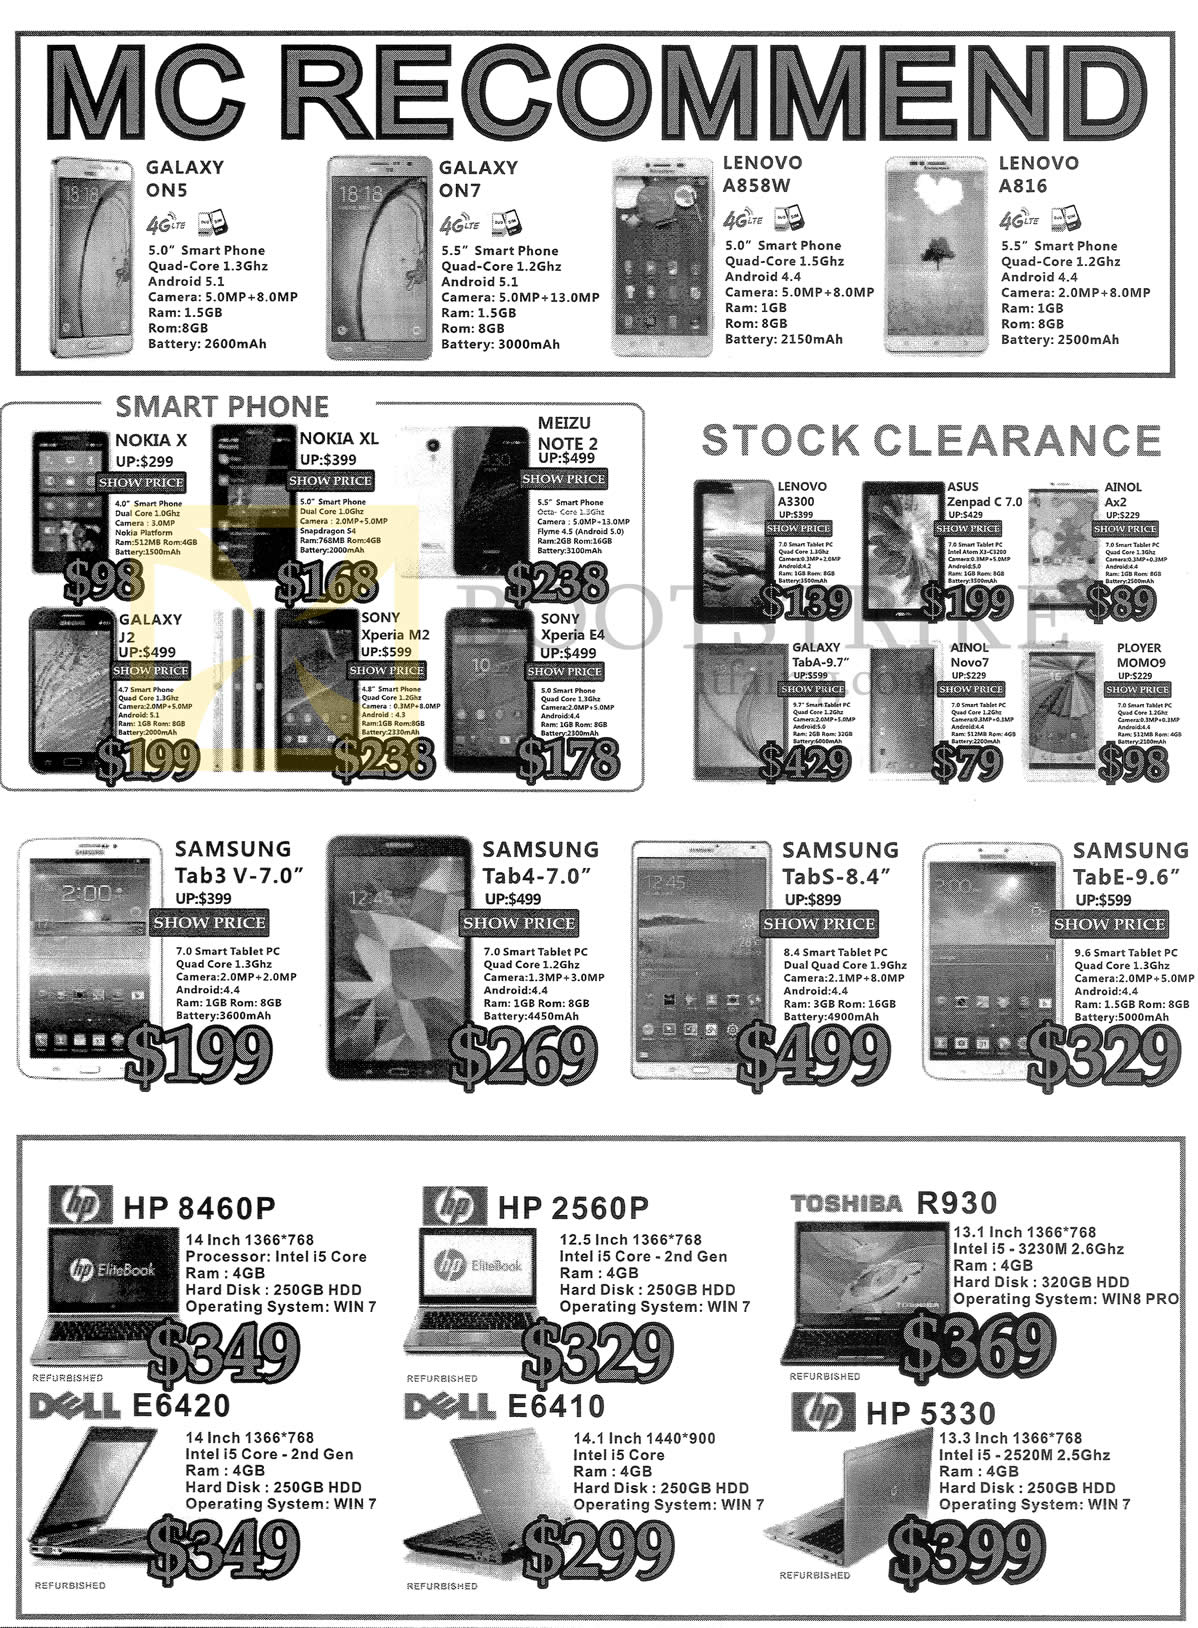 nokia phone 2016 price list. it show 2016 price list image brochure of j2 mobile phones, notebooks, galaxy on5. « nokia phone p